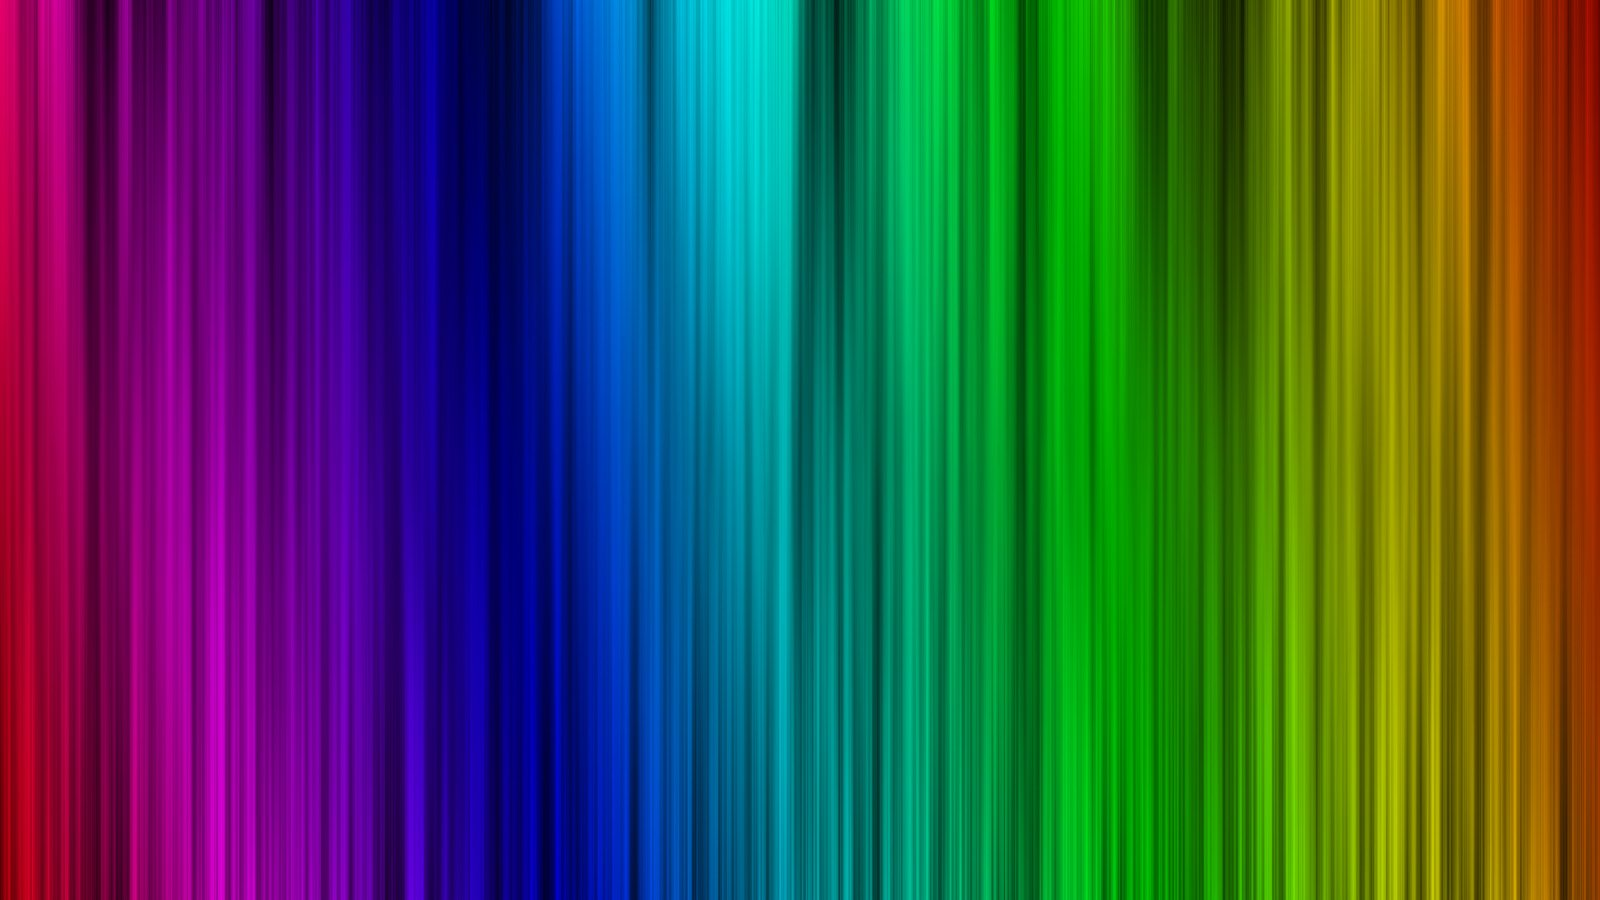 Free Rainbow Curtain Stock Photo Freeimages Com